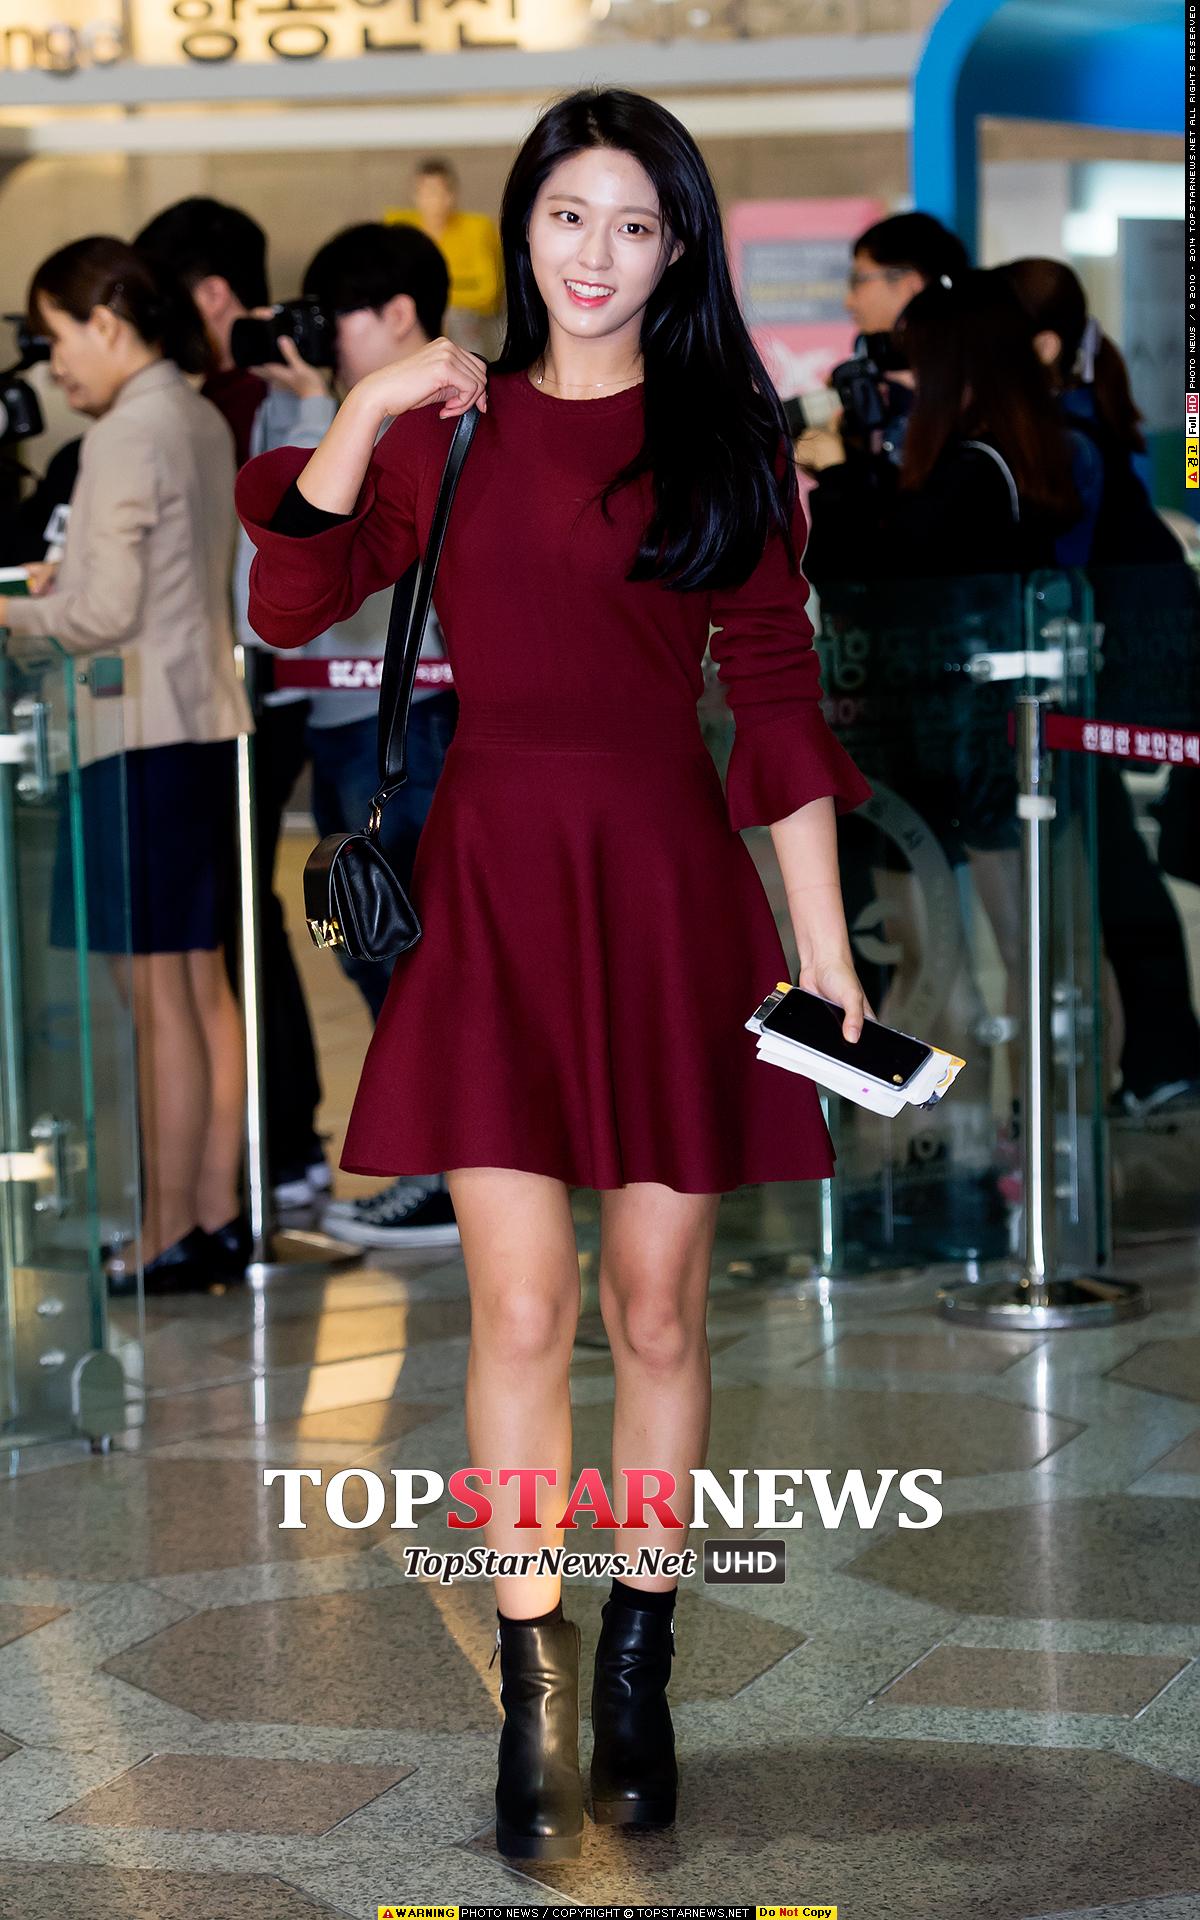 AOA雪炫在機場以今年秋冬時尚代表色「酒紅」做了最完整的示範,簡單大方的洋裝設計搭配短靴,真是賞心悅目。